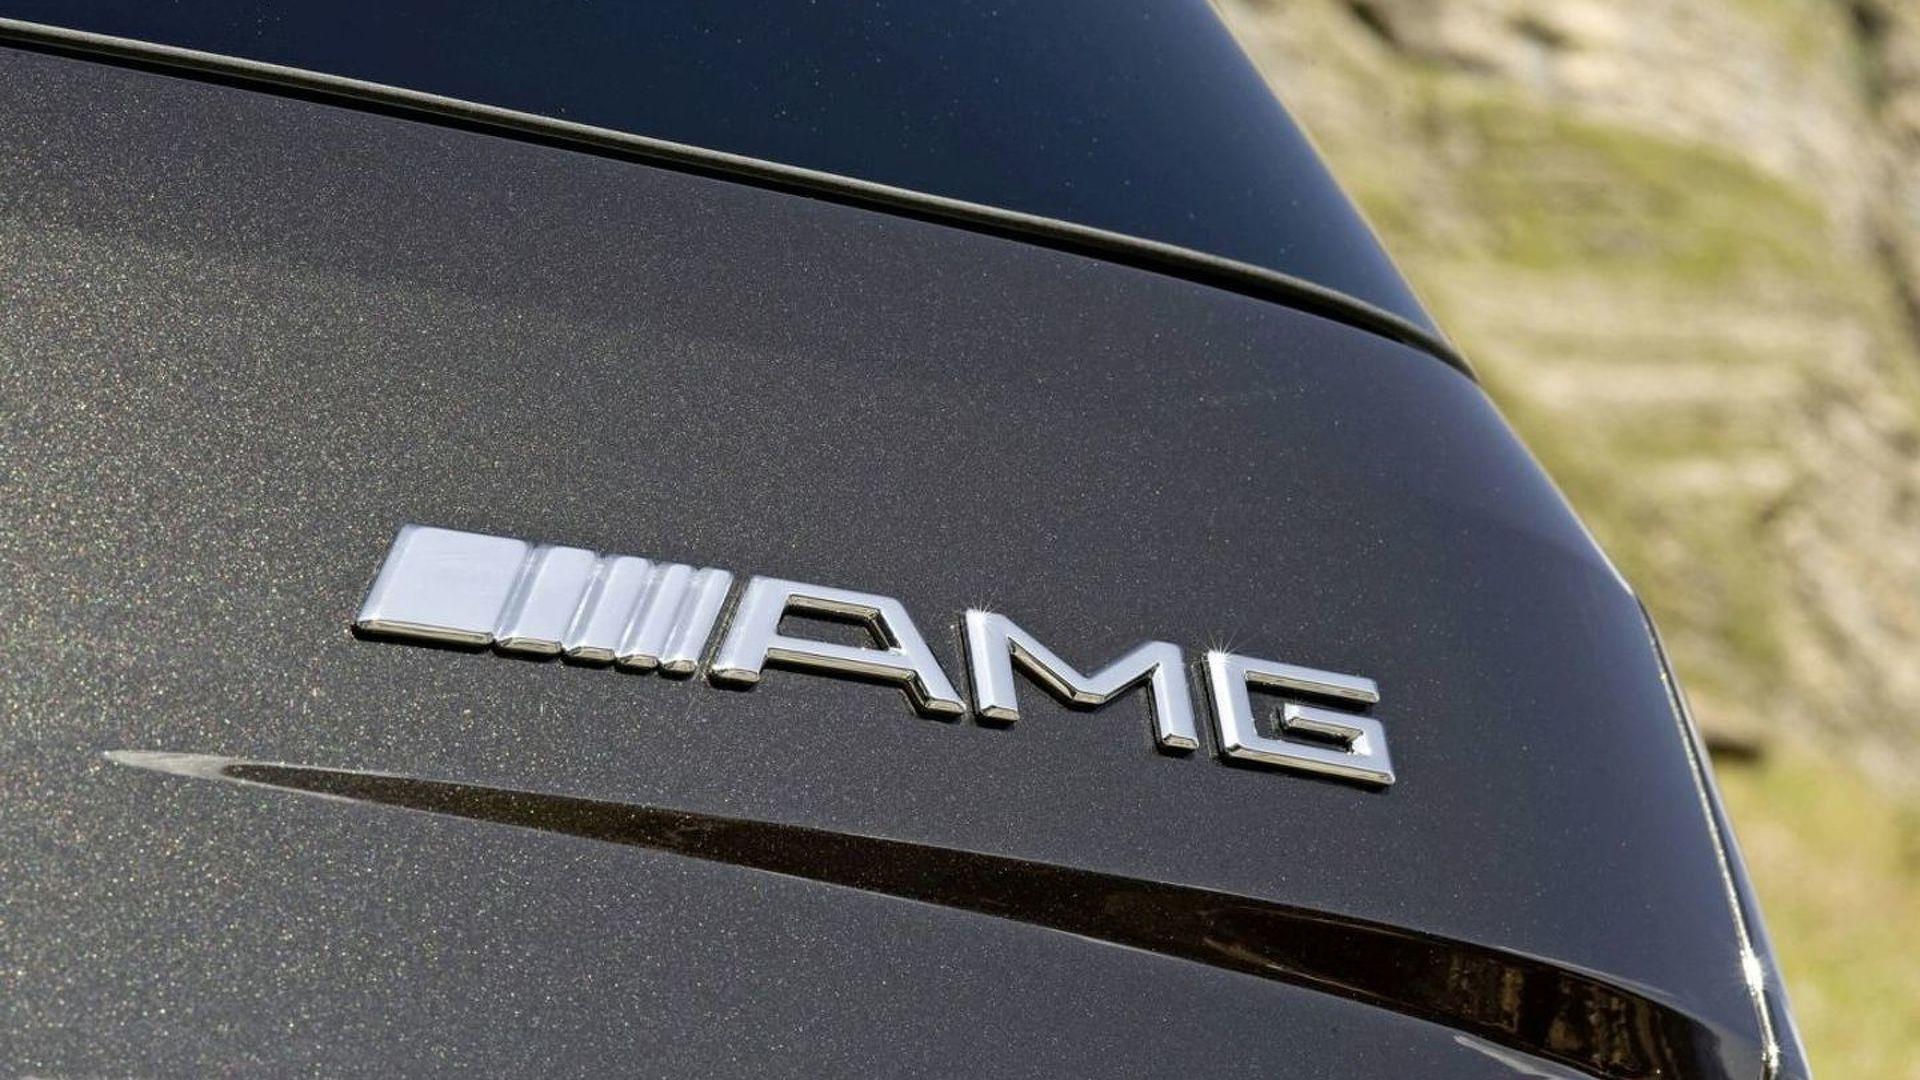 Daimler says upcoming Aston Martins will not receive AMG badging